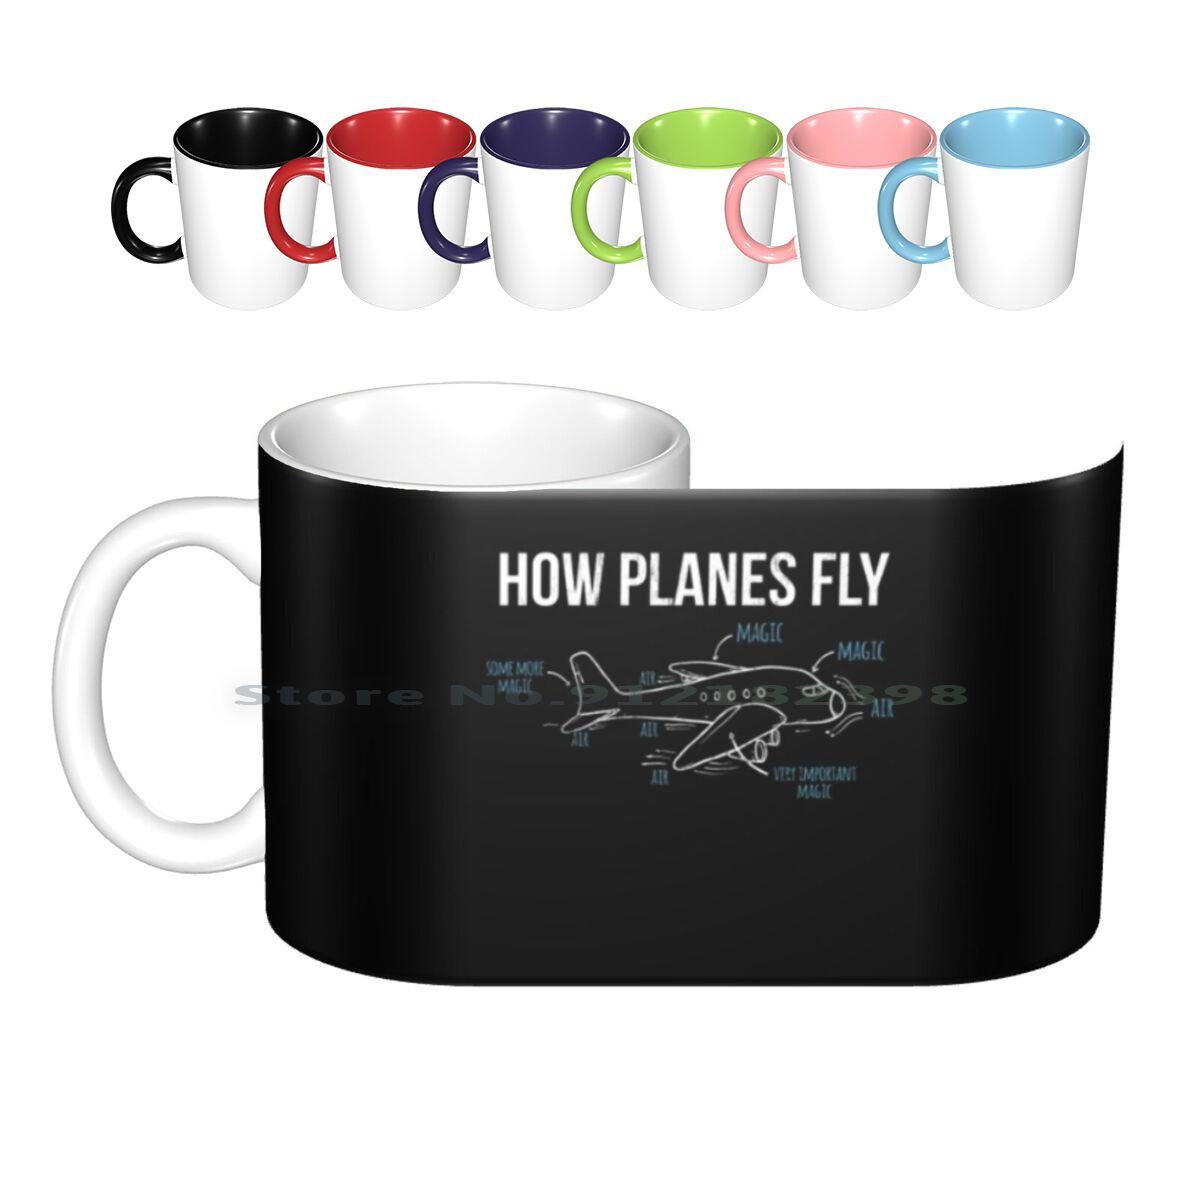 How Planes Fly Funny Aerospace Engineer Engineering Ceramic Mugs Coffee Cups Milk Tea Mug How Planes Funny Engineer Fly Flight